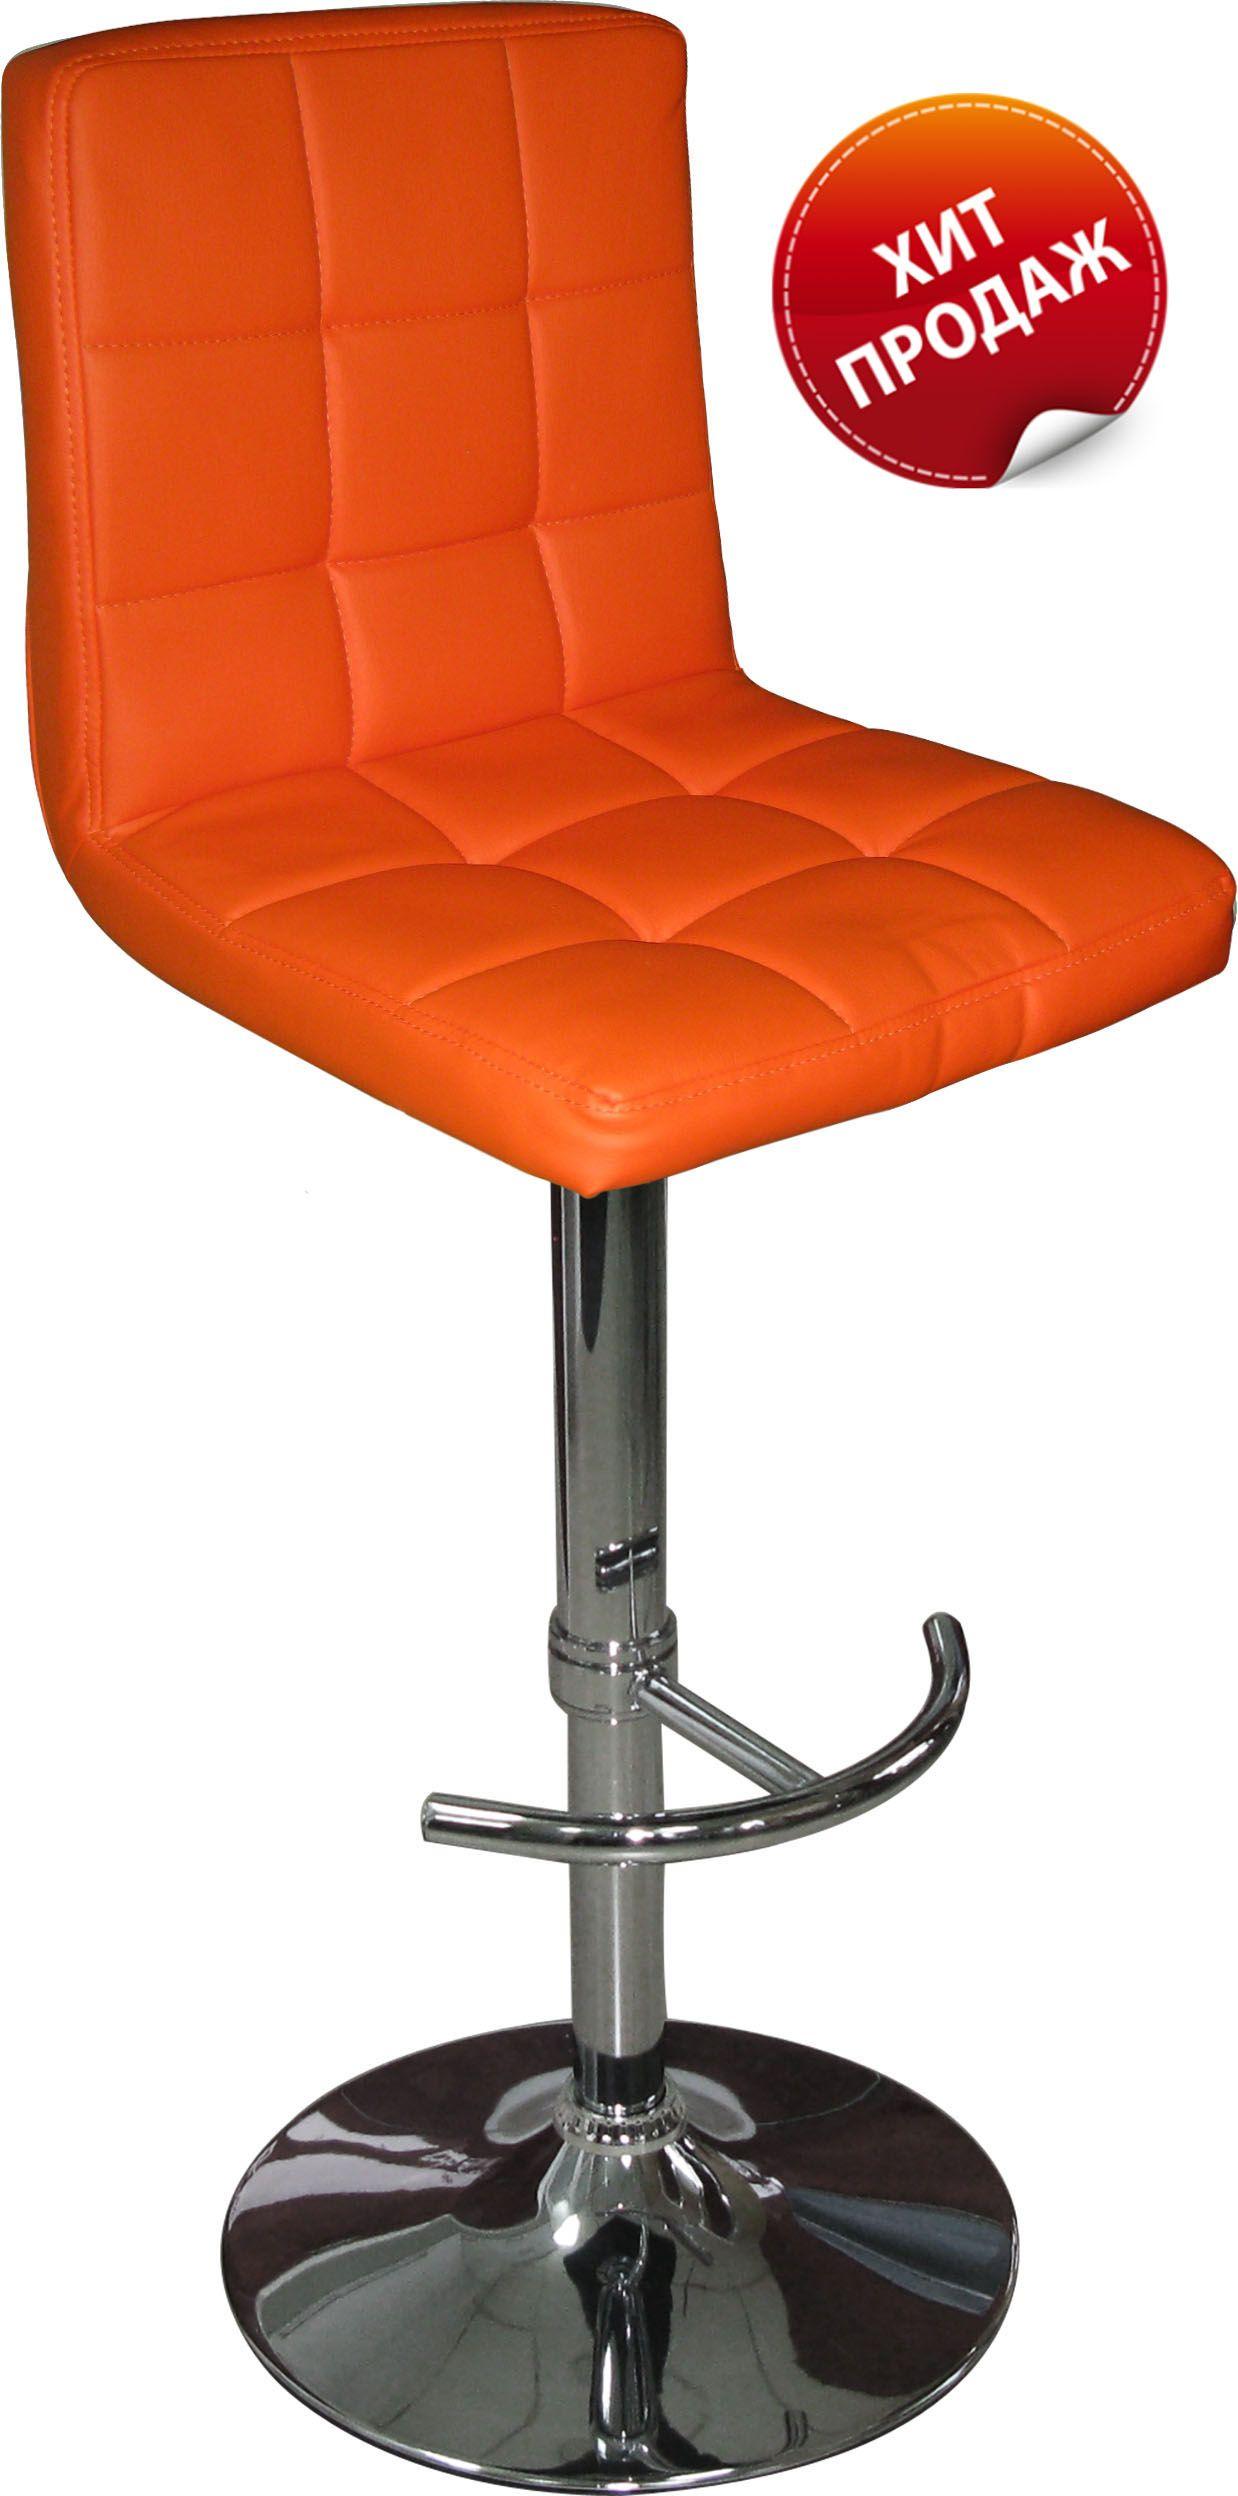 Барный стул (арт.HC-103F) оранжевыйМебель для дома<br><br><br>Артикул: HC-103F<br>Бренд: Ravta<br>Цвет: оранжевый<br>Вид мебели: Барный стул<br>Каркас мебели: гальваника<br>Тип материала мебели: кожзам